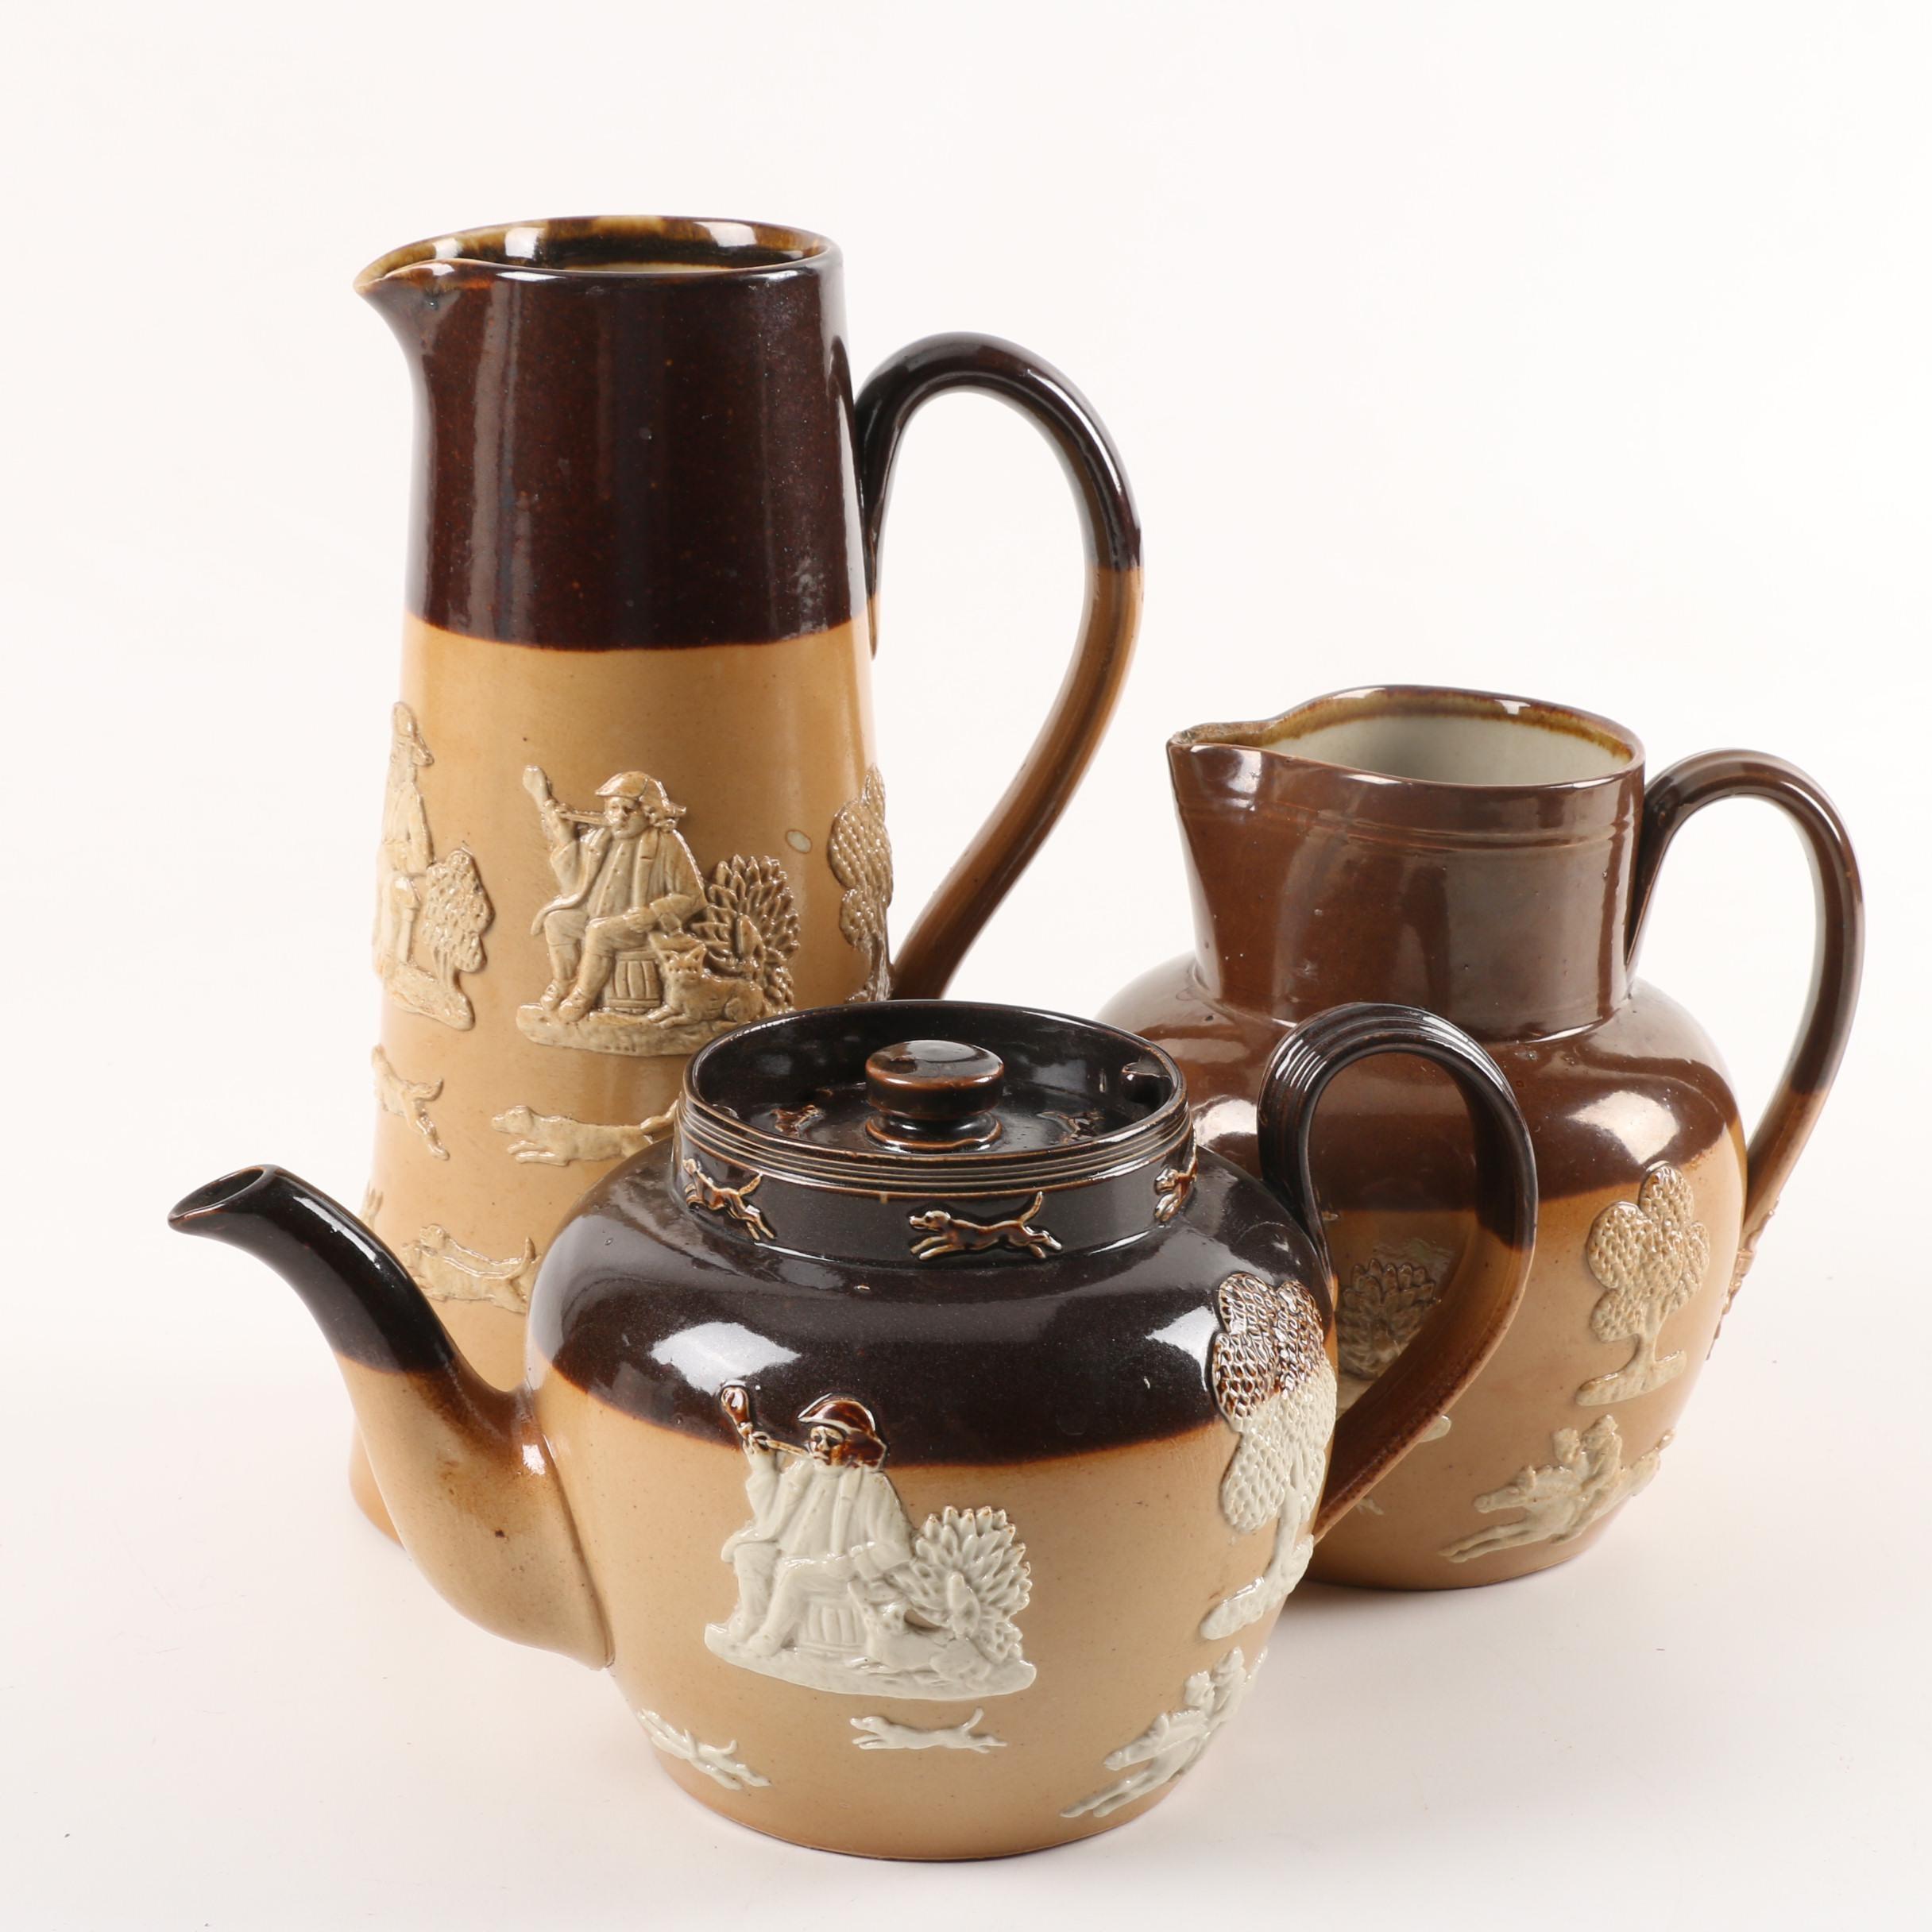 Royal Doulton Salt Glazed Stoneware Jugs and Teapot ca. 1902-22